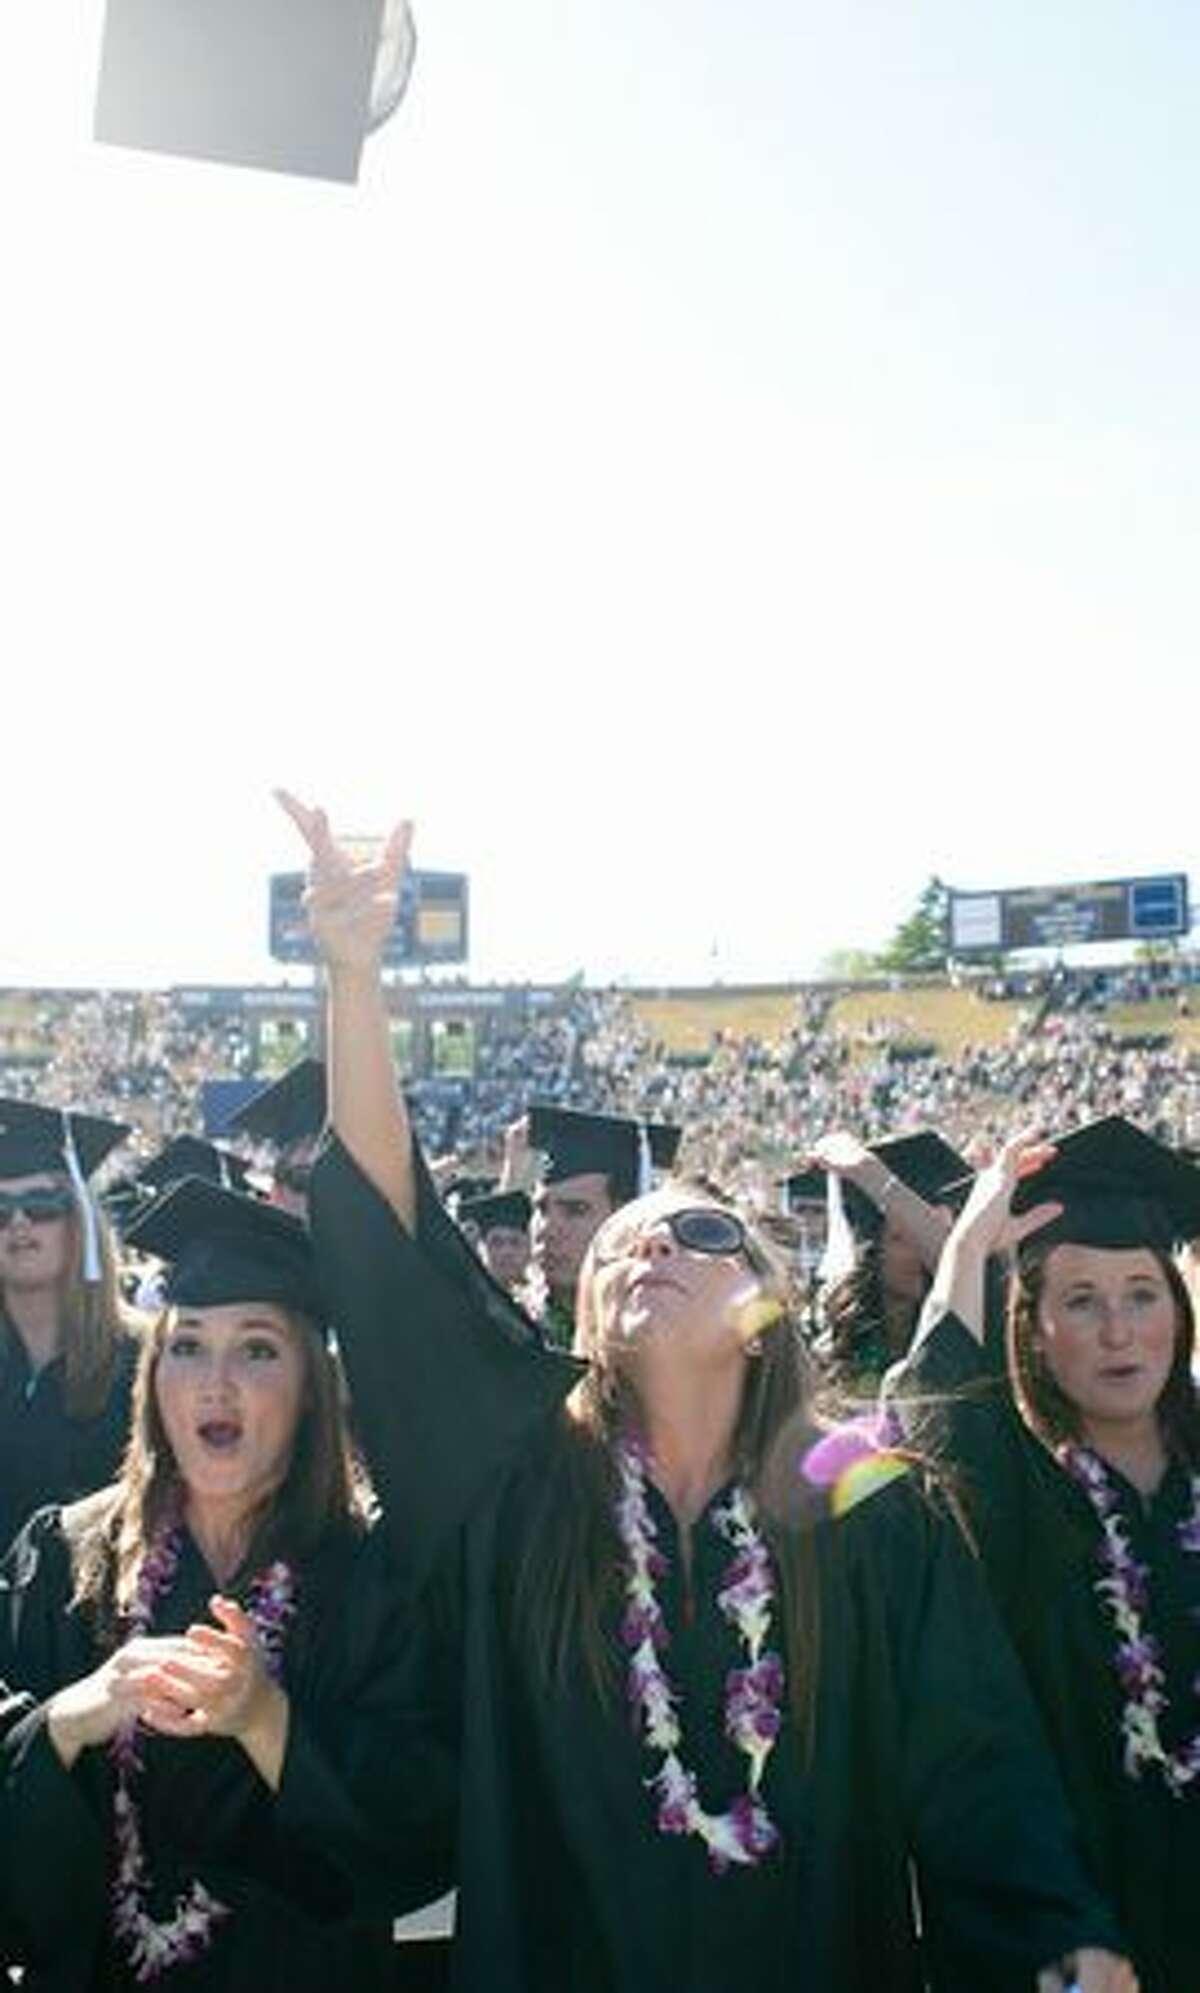 Graduates throw their caps as the ceremony concludes.